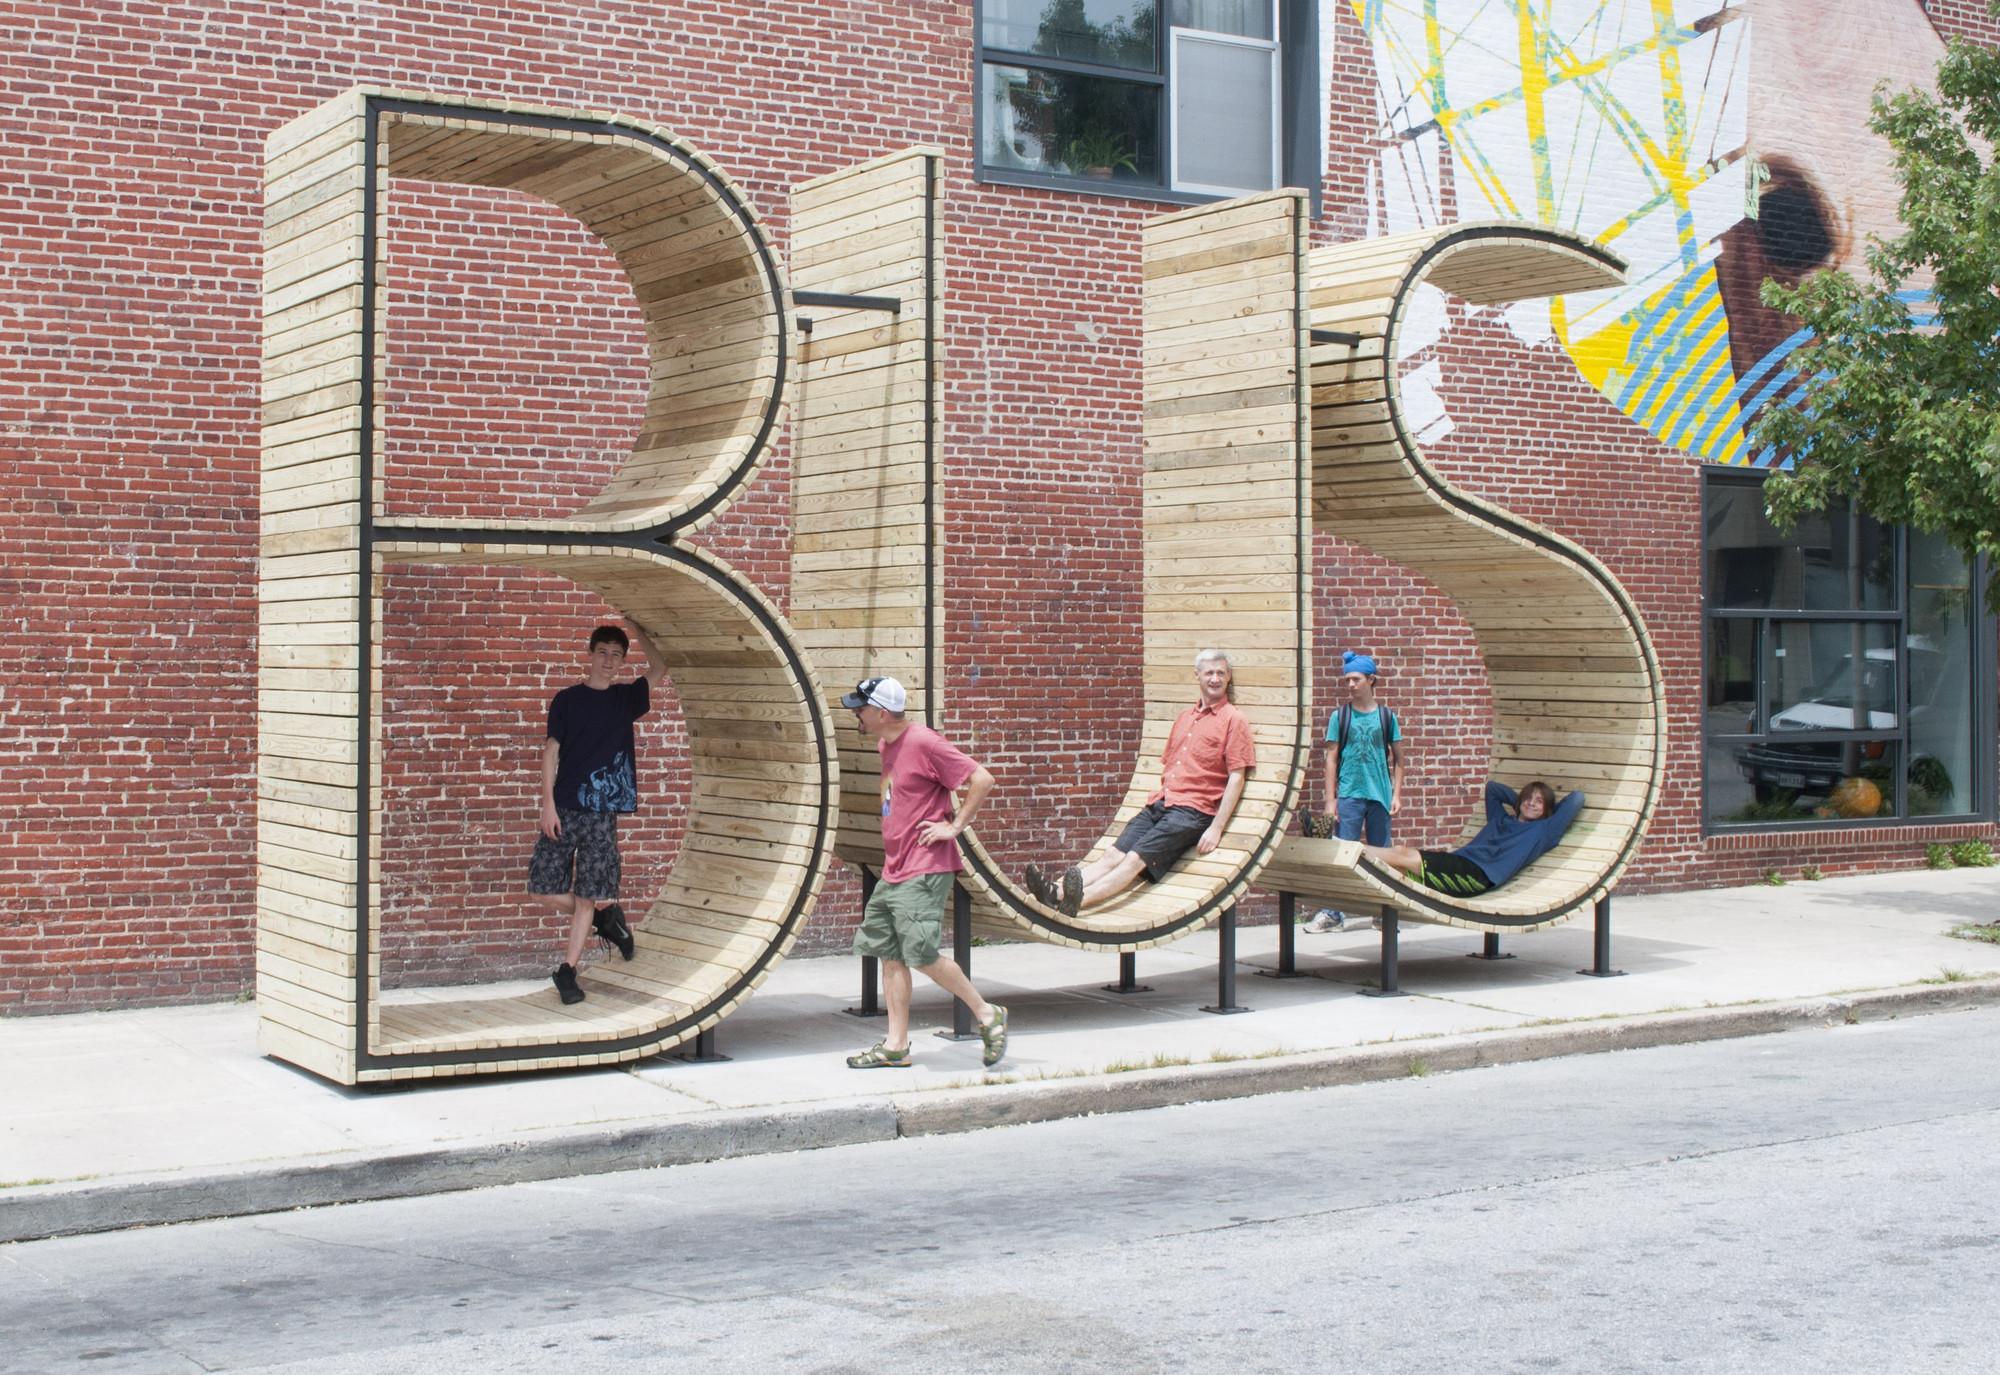 Intervención Urbana: BUS Stop, escultura que funciona como parada de autobús , Courtesy of mmmm...